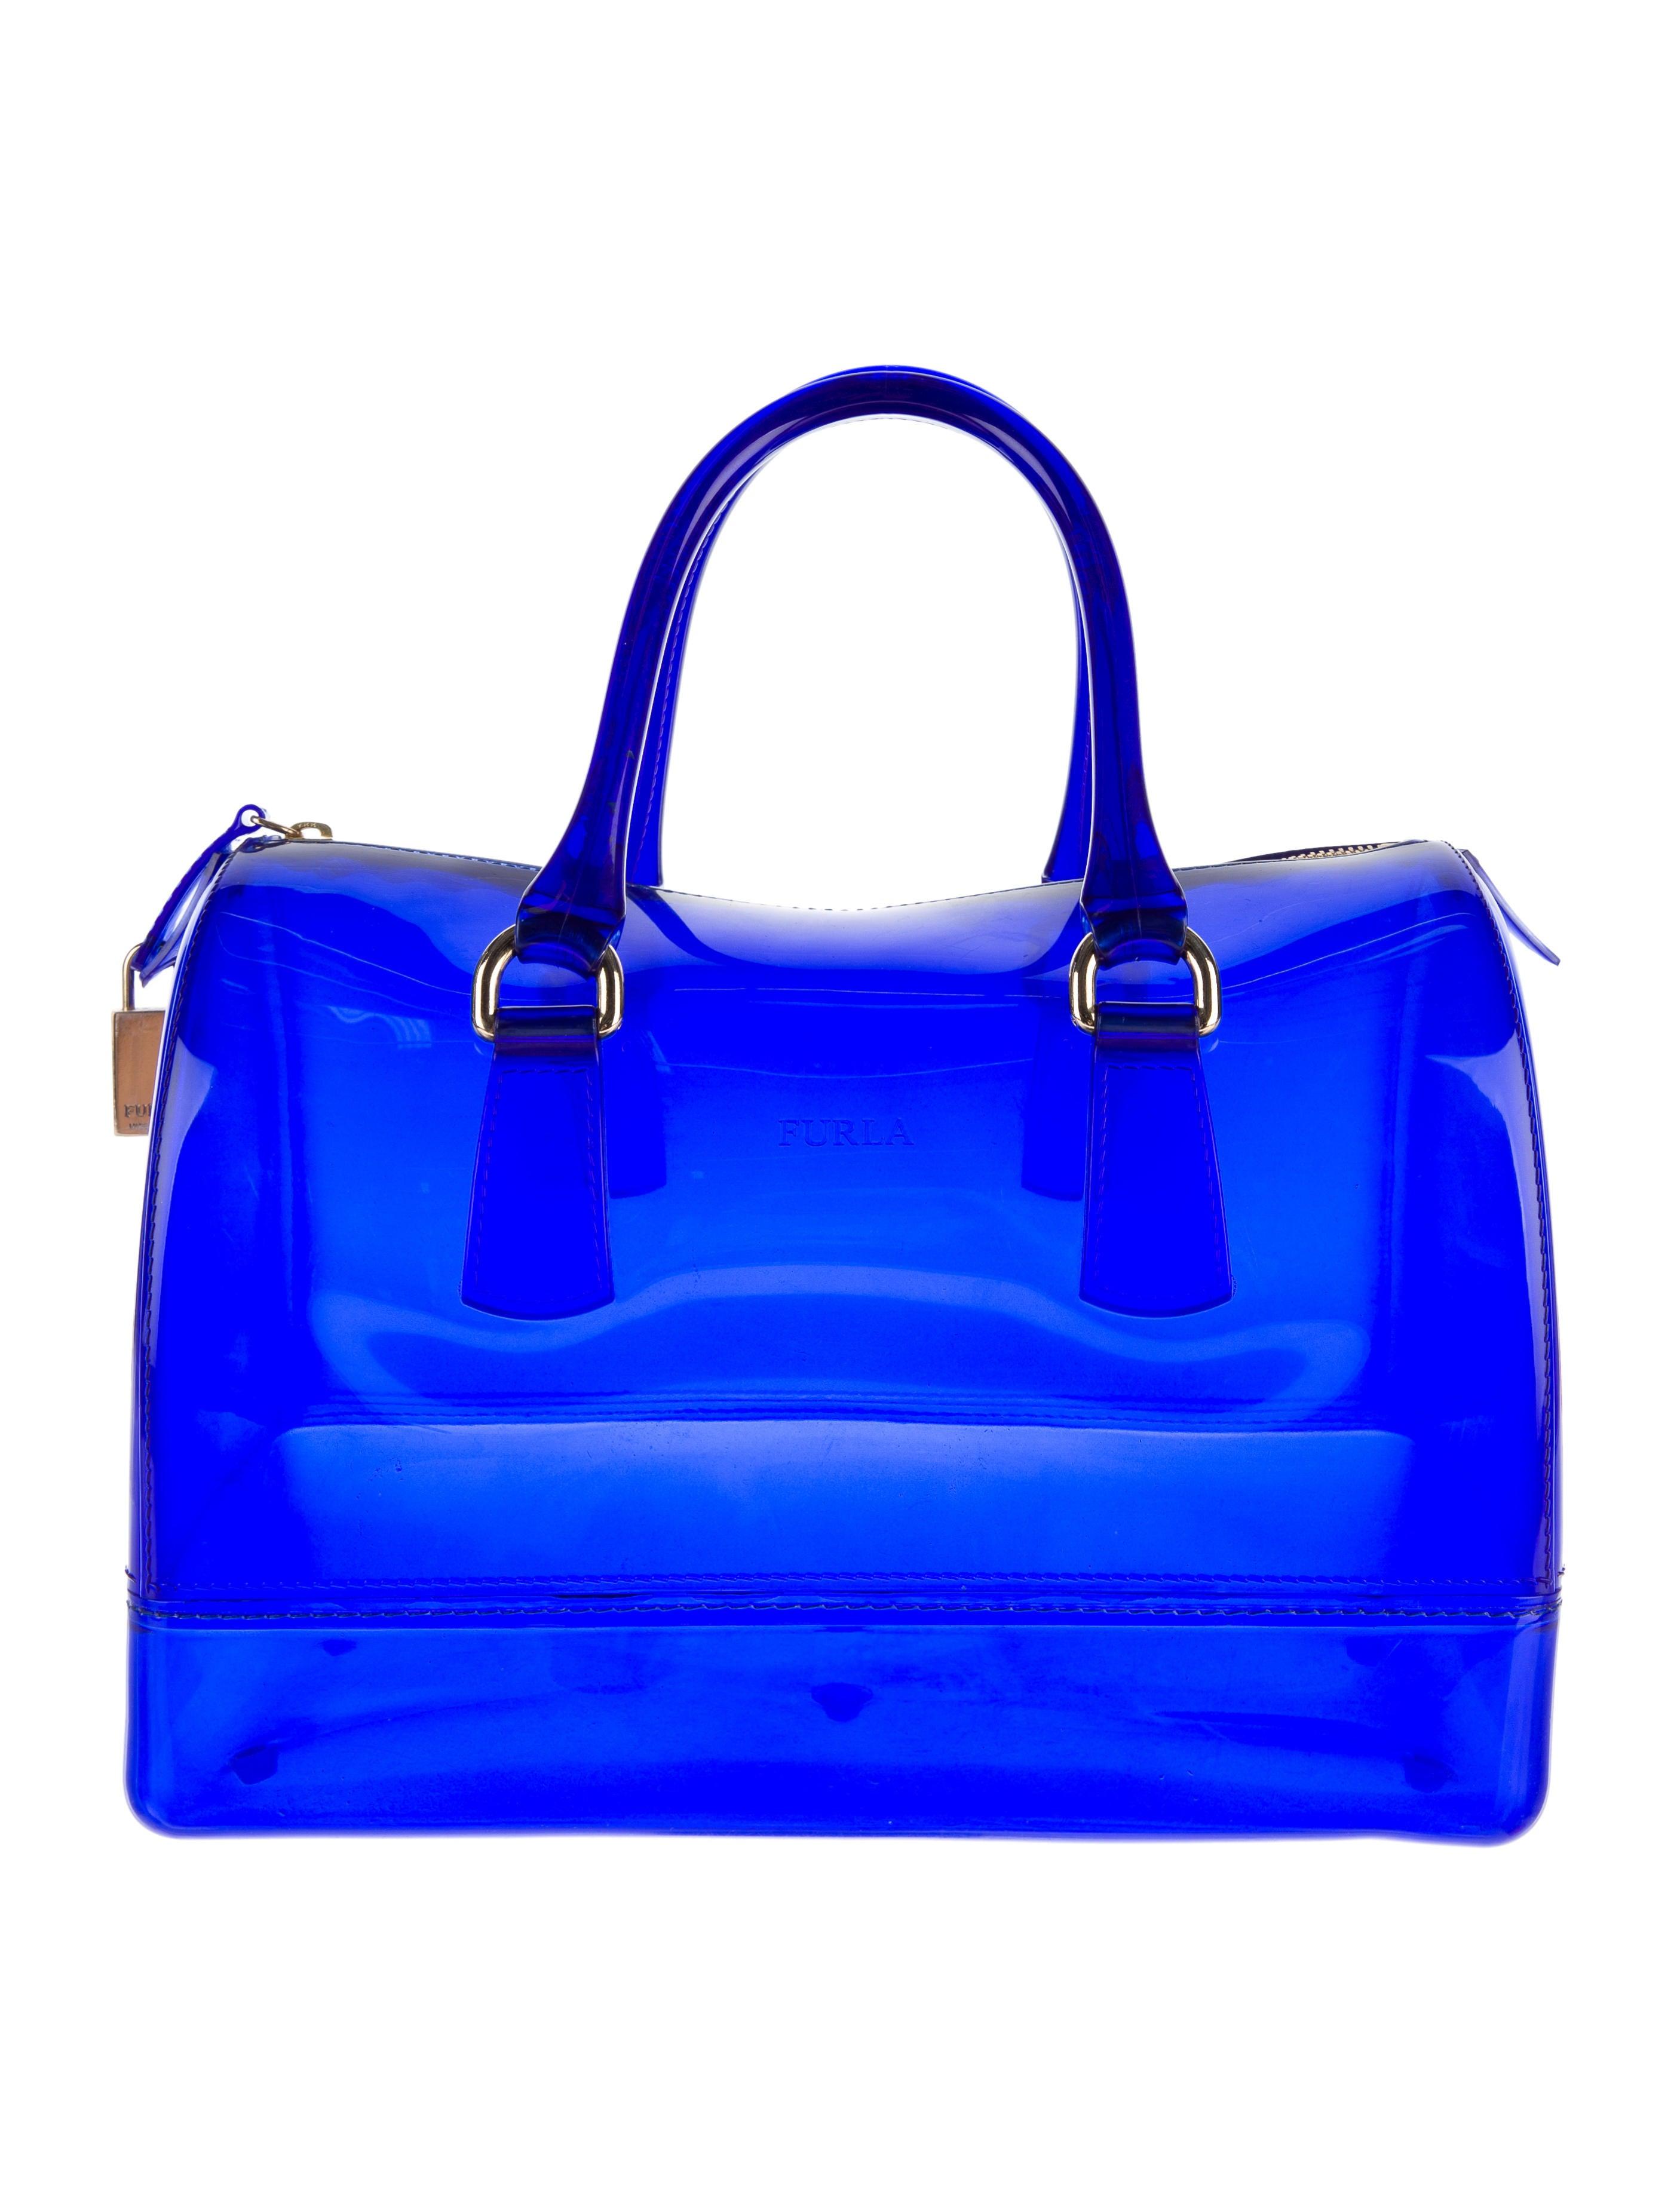 Furla Candy Bag Handbags Wfu20257 The Realreal